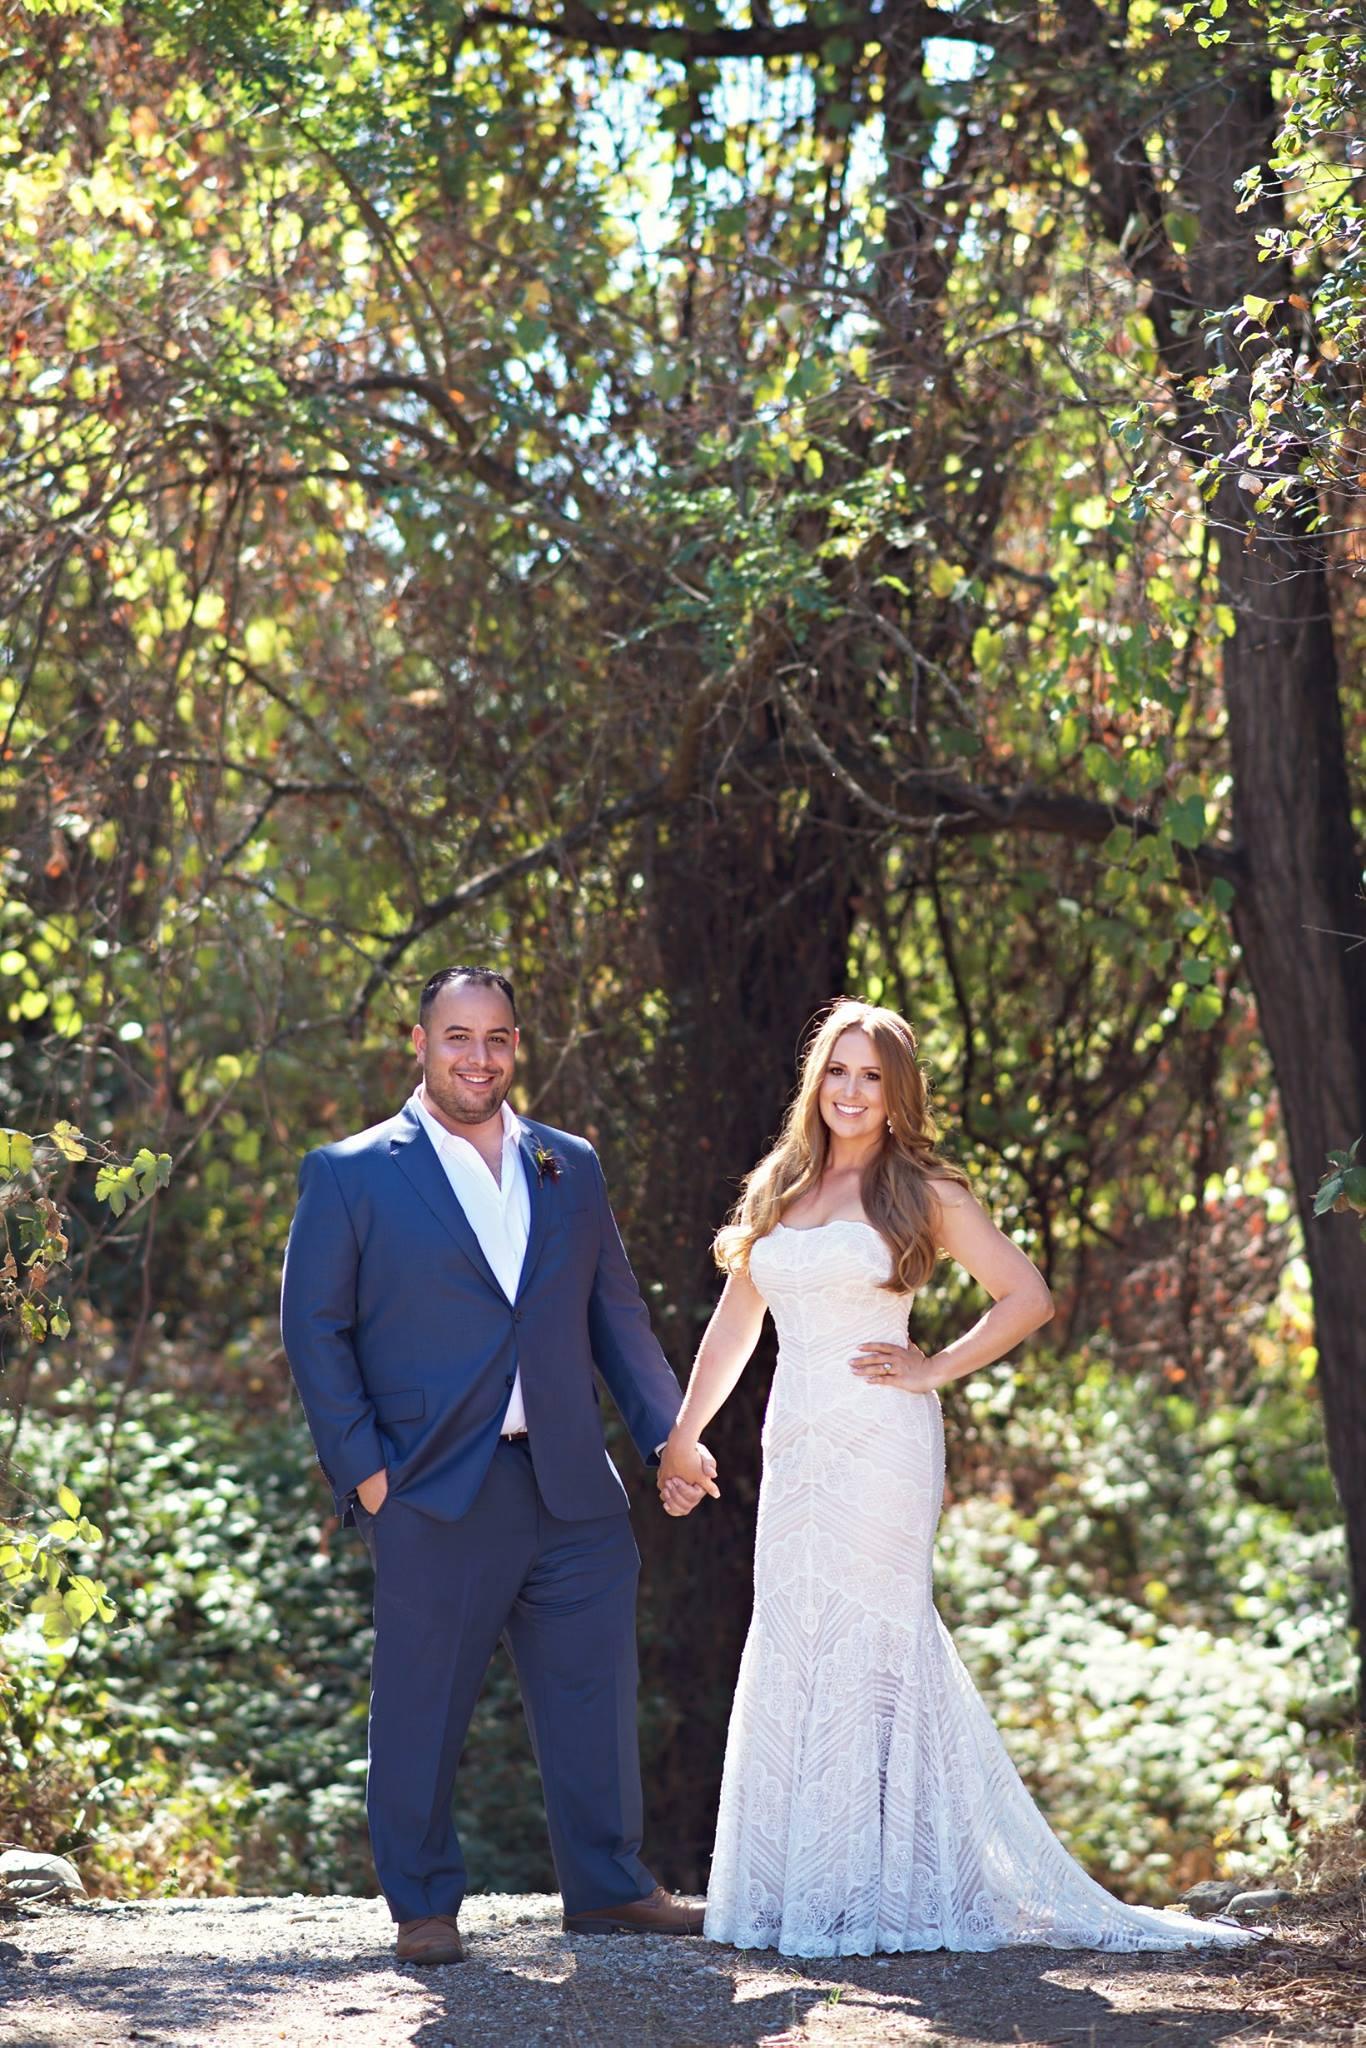 wedding photo 11.jpg